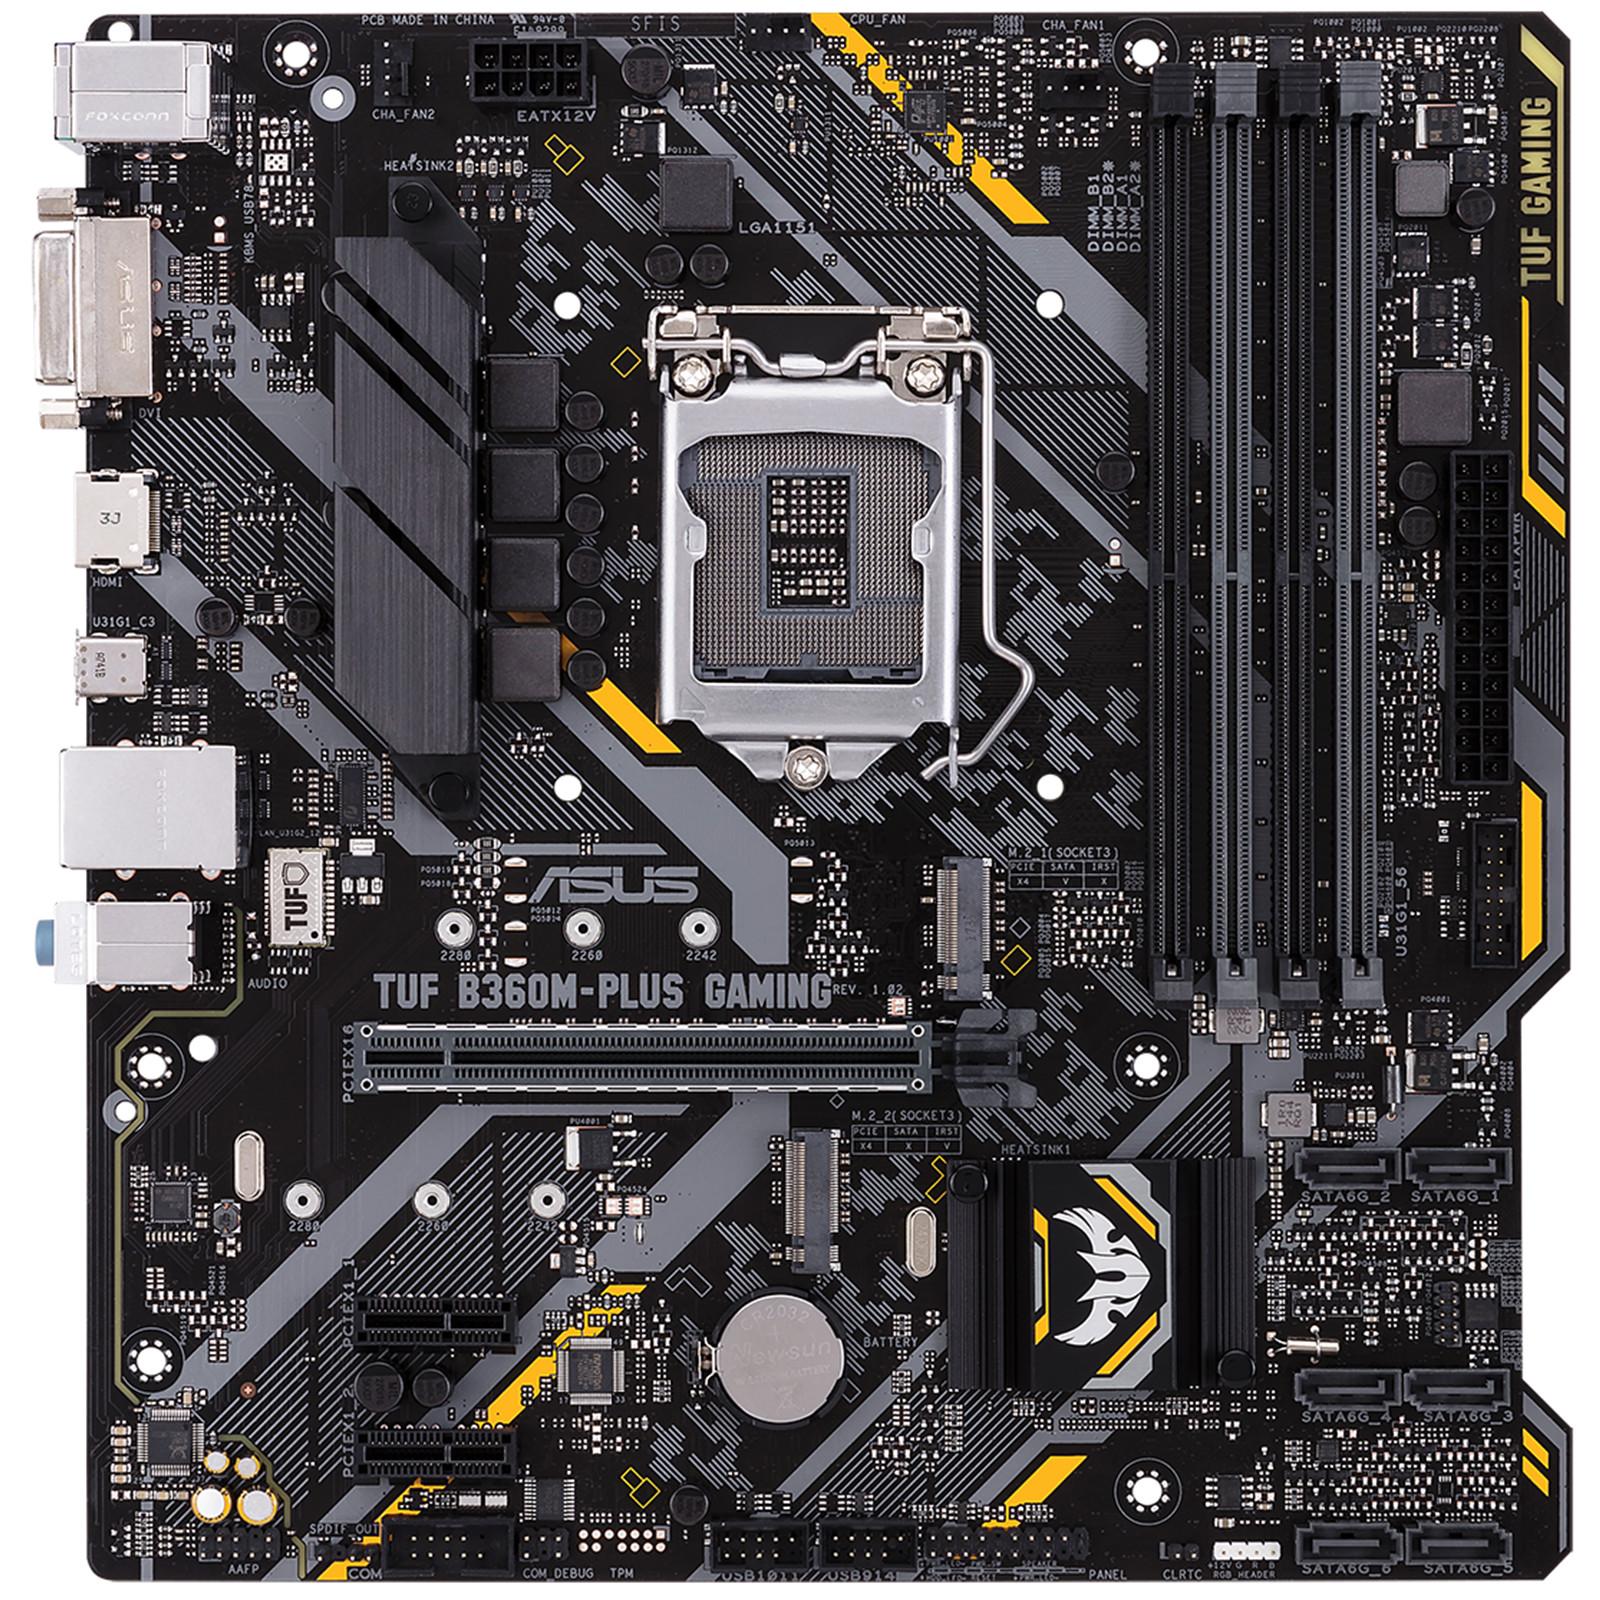 Buy the ASUS TUF B360M-PLUS GAMING MATX Form, For Intel 8th/9th Gen